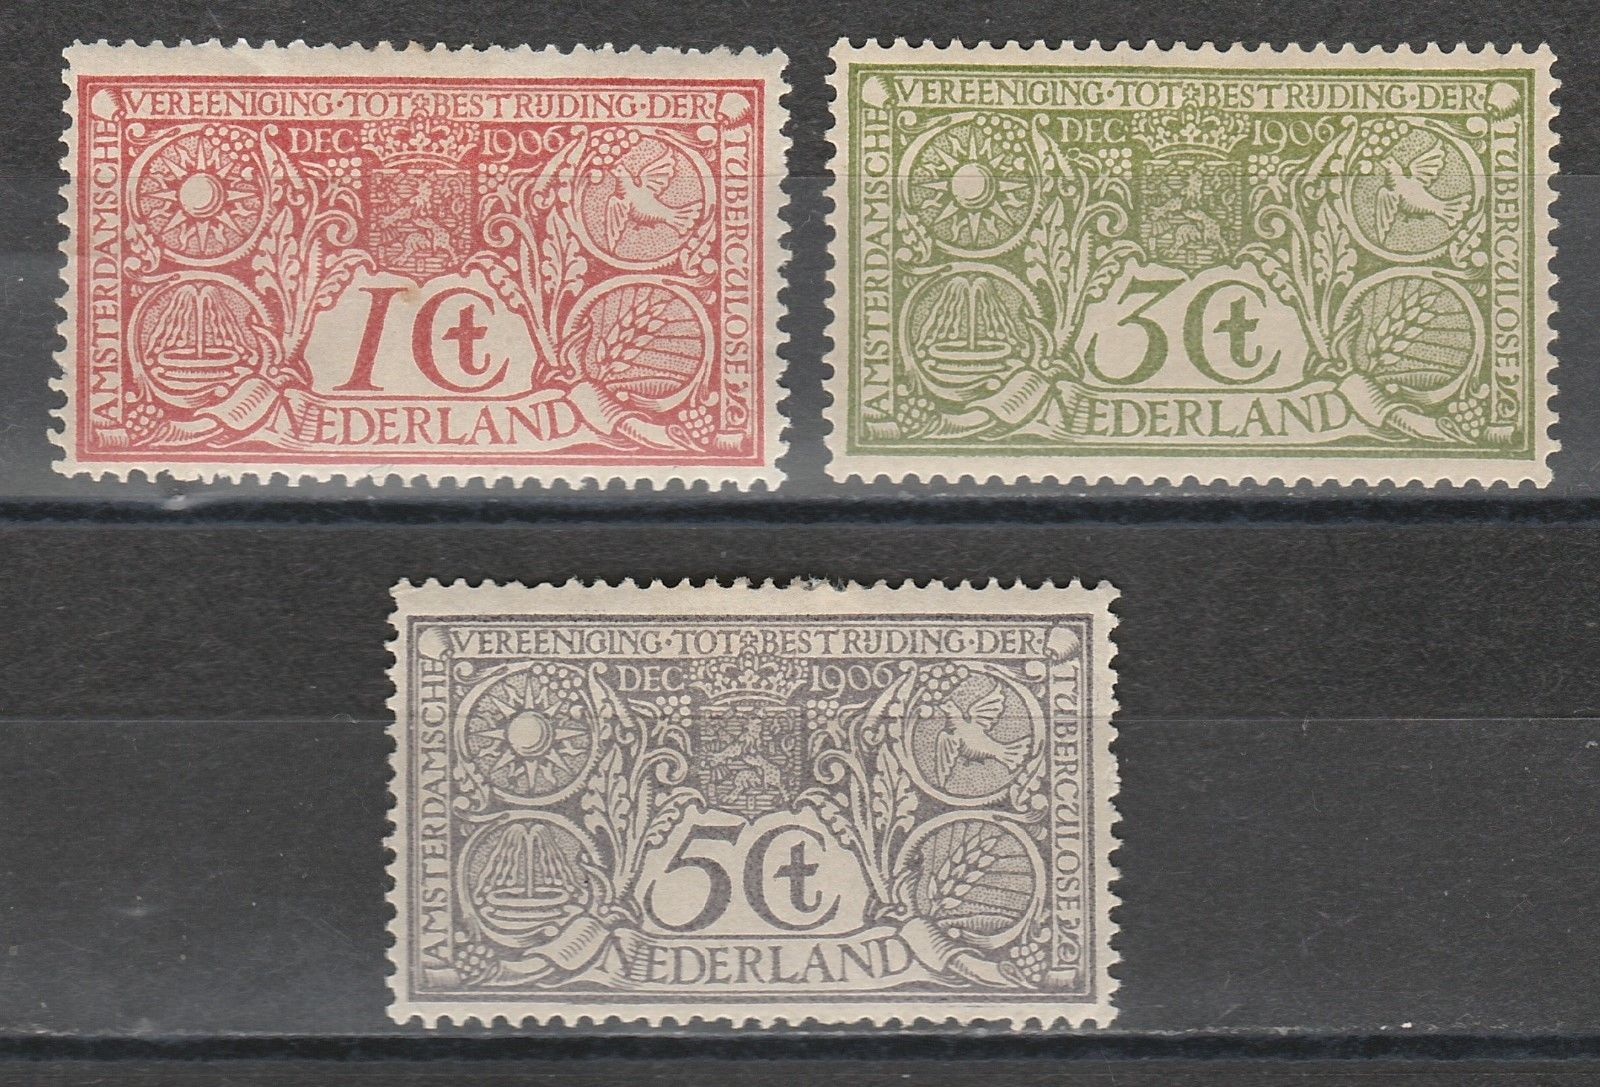 Netherlands TB 1906